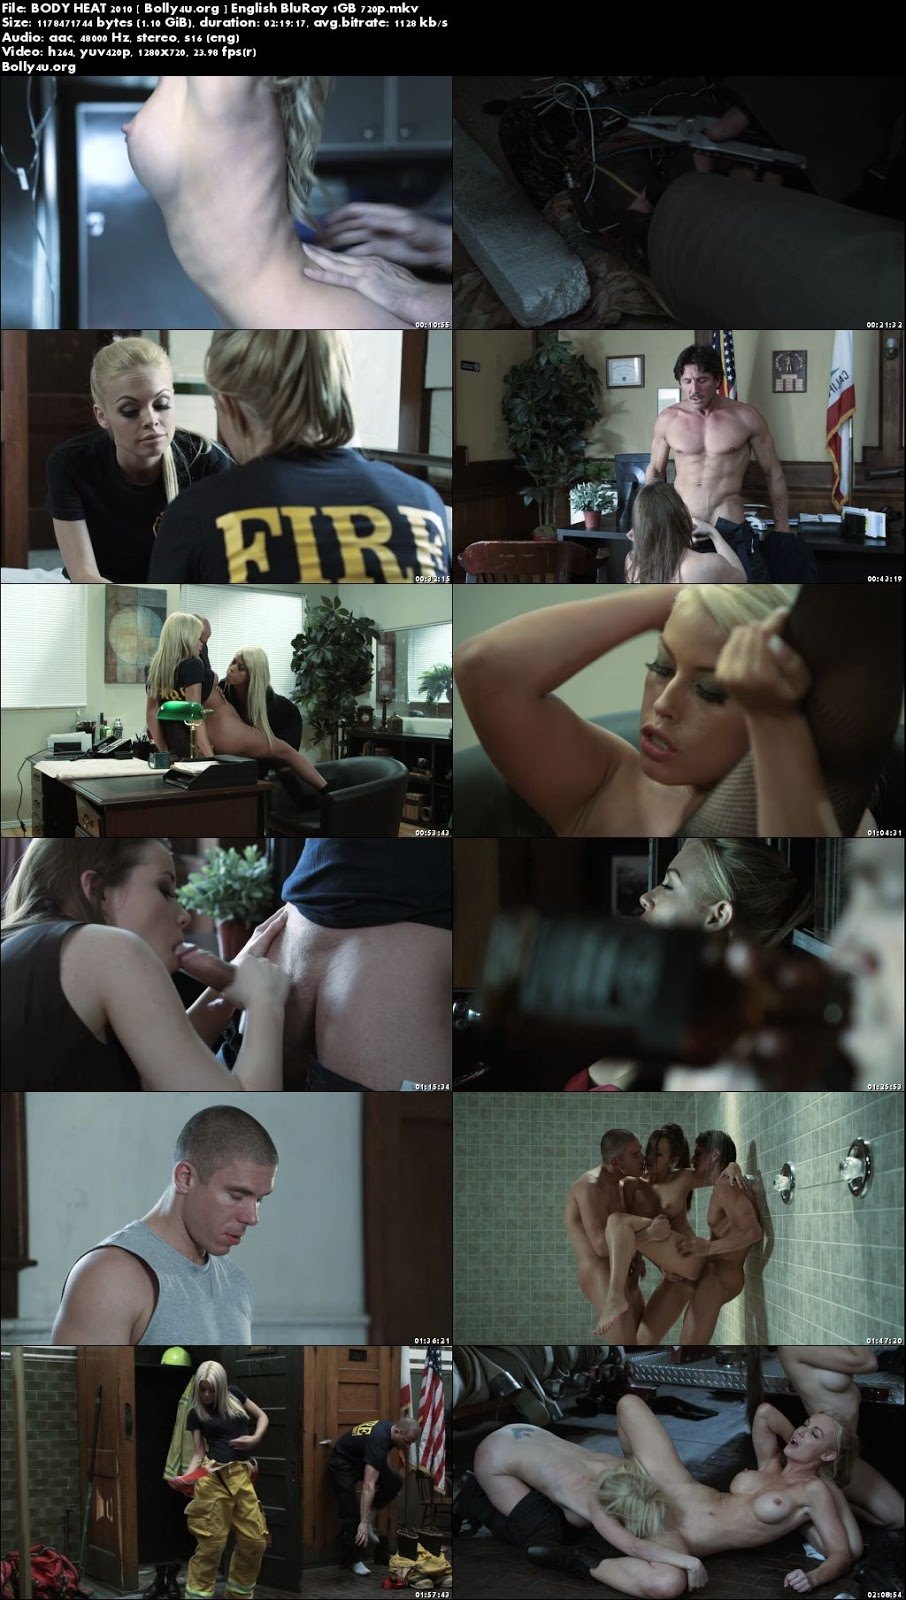 Body HeaT 2010 BluRay 400Mb Full English Movie Download 480p